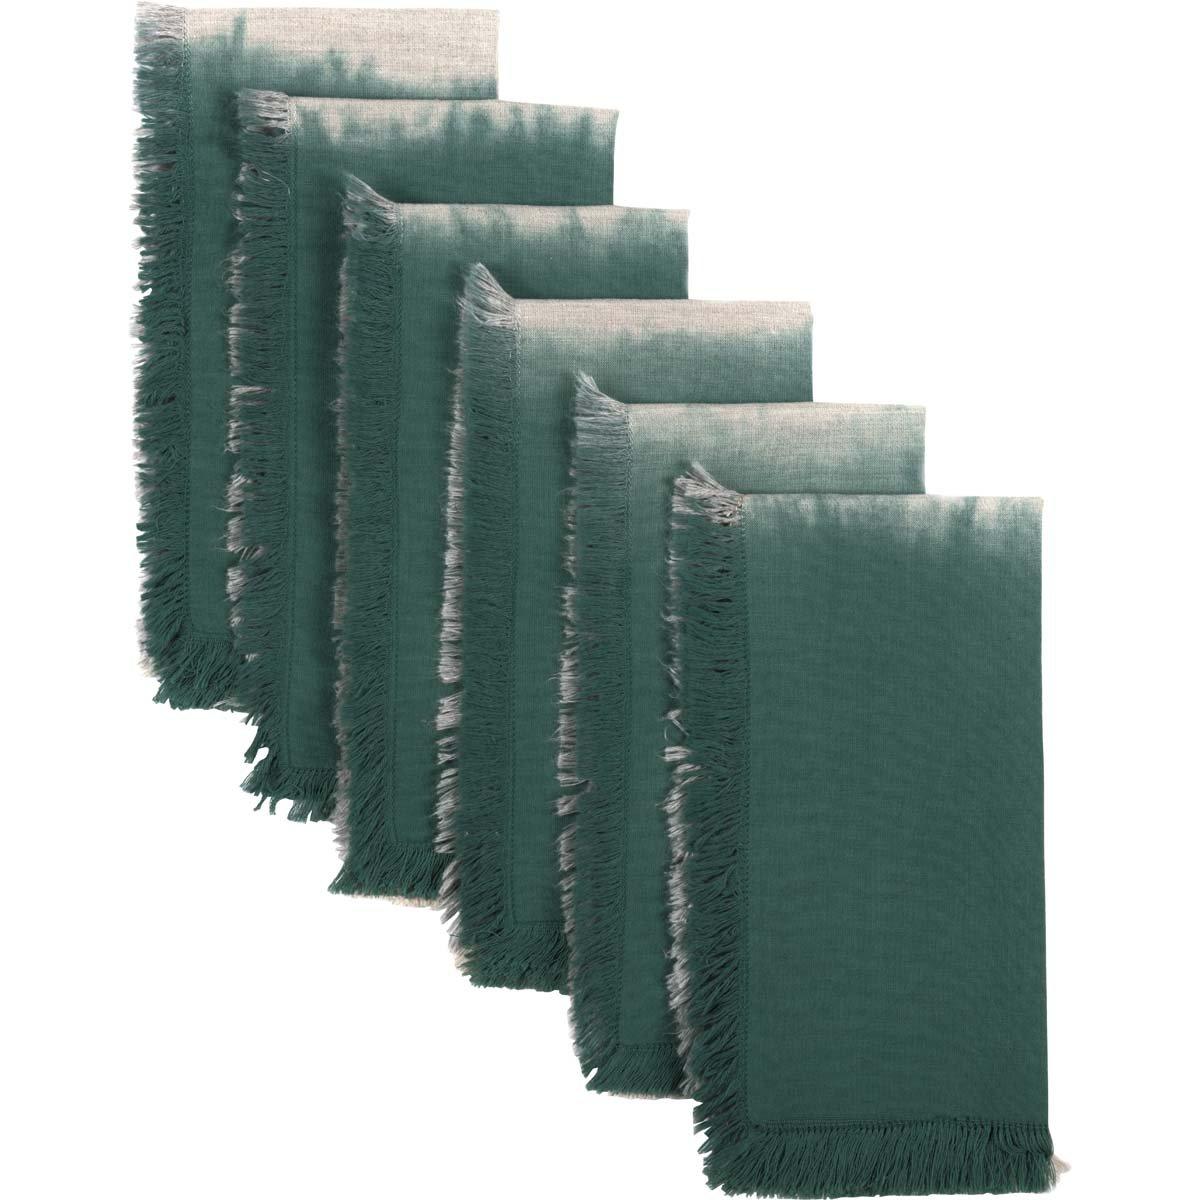 VHC Brands Farmhouse Tabletop & Kitchen - Jessa Ombre Green Napkin Set of 6, Creme